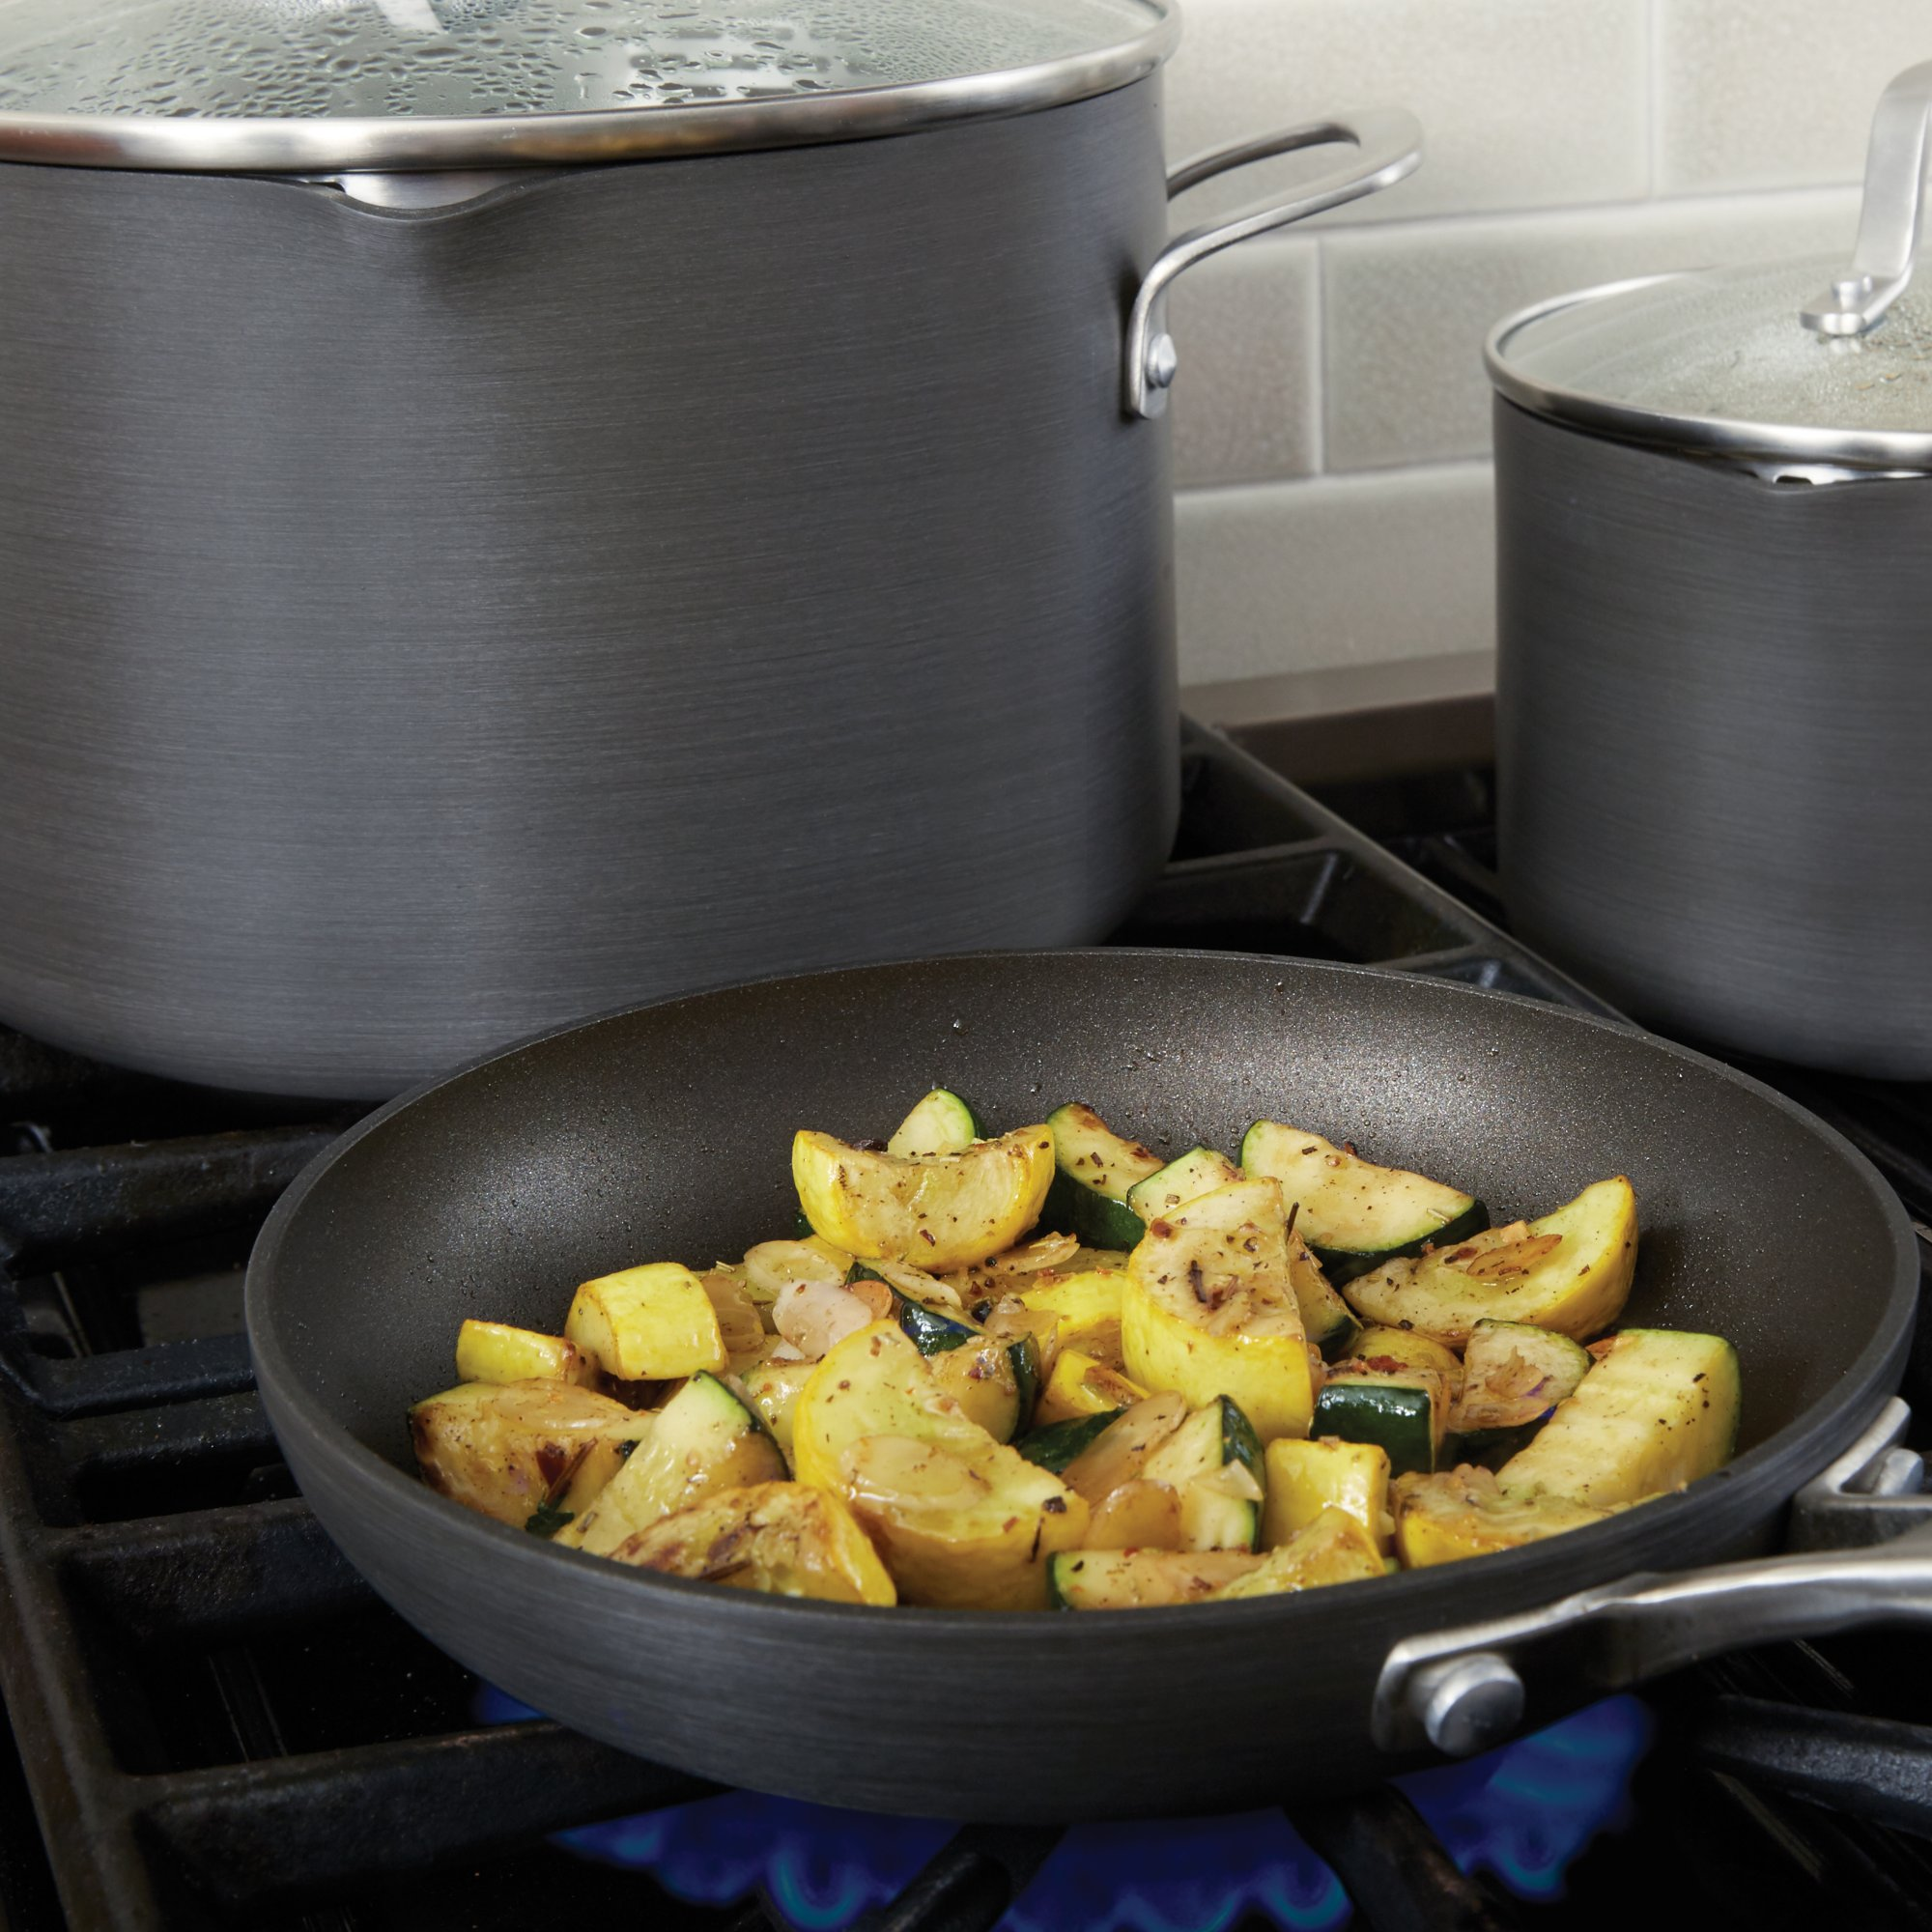 Calphalon Classic™ Nonstick 10-pc. Cookware Set